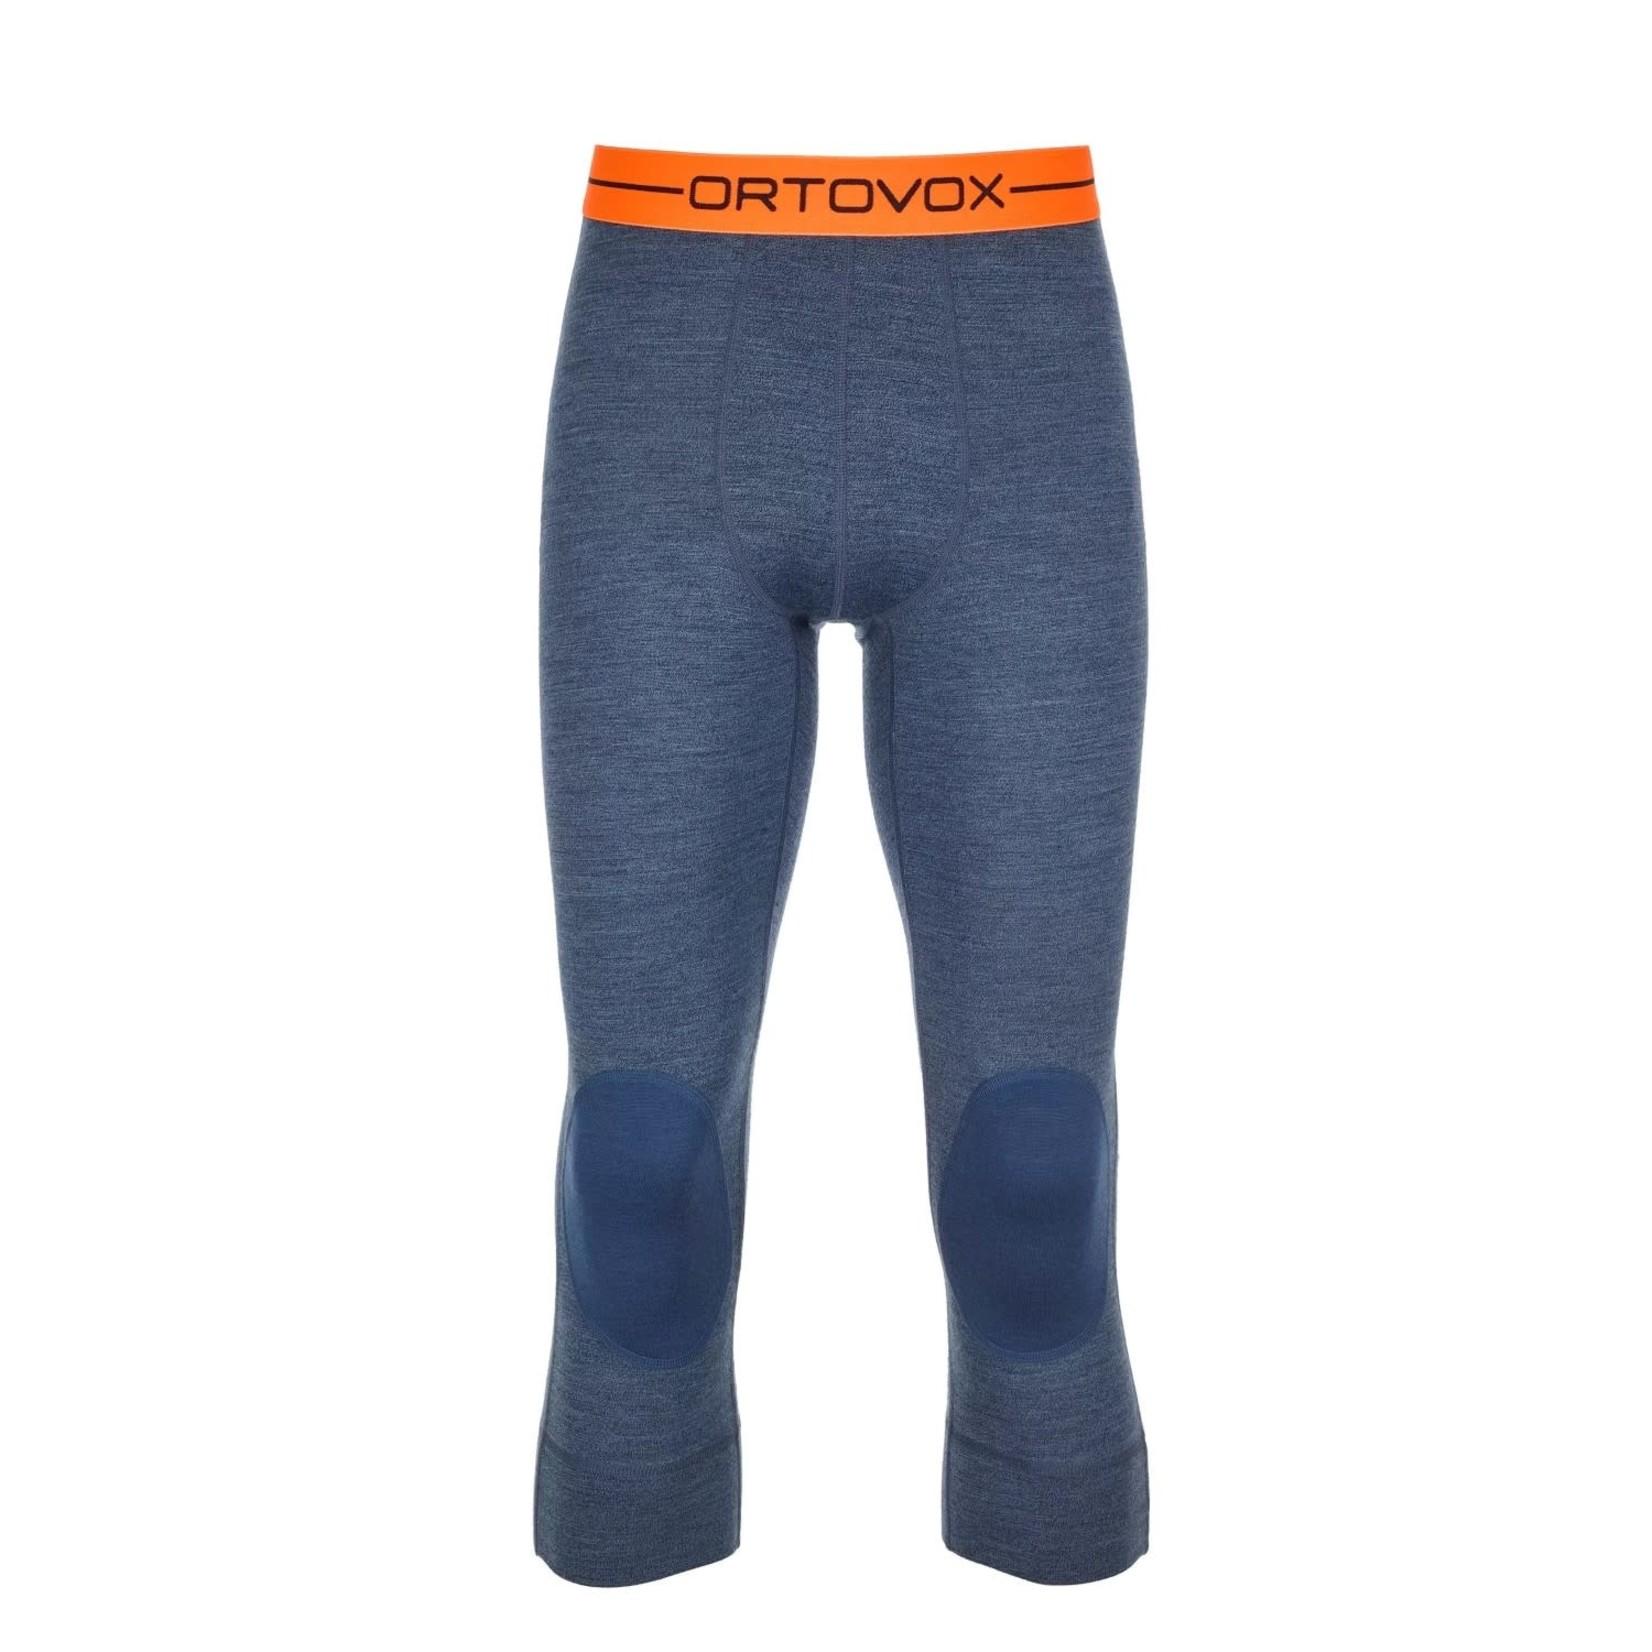 Ortovox Ortovox 185 Rock'N'Wool Short Pants - Men